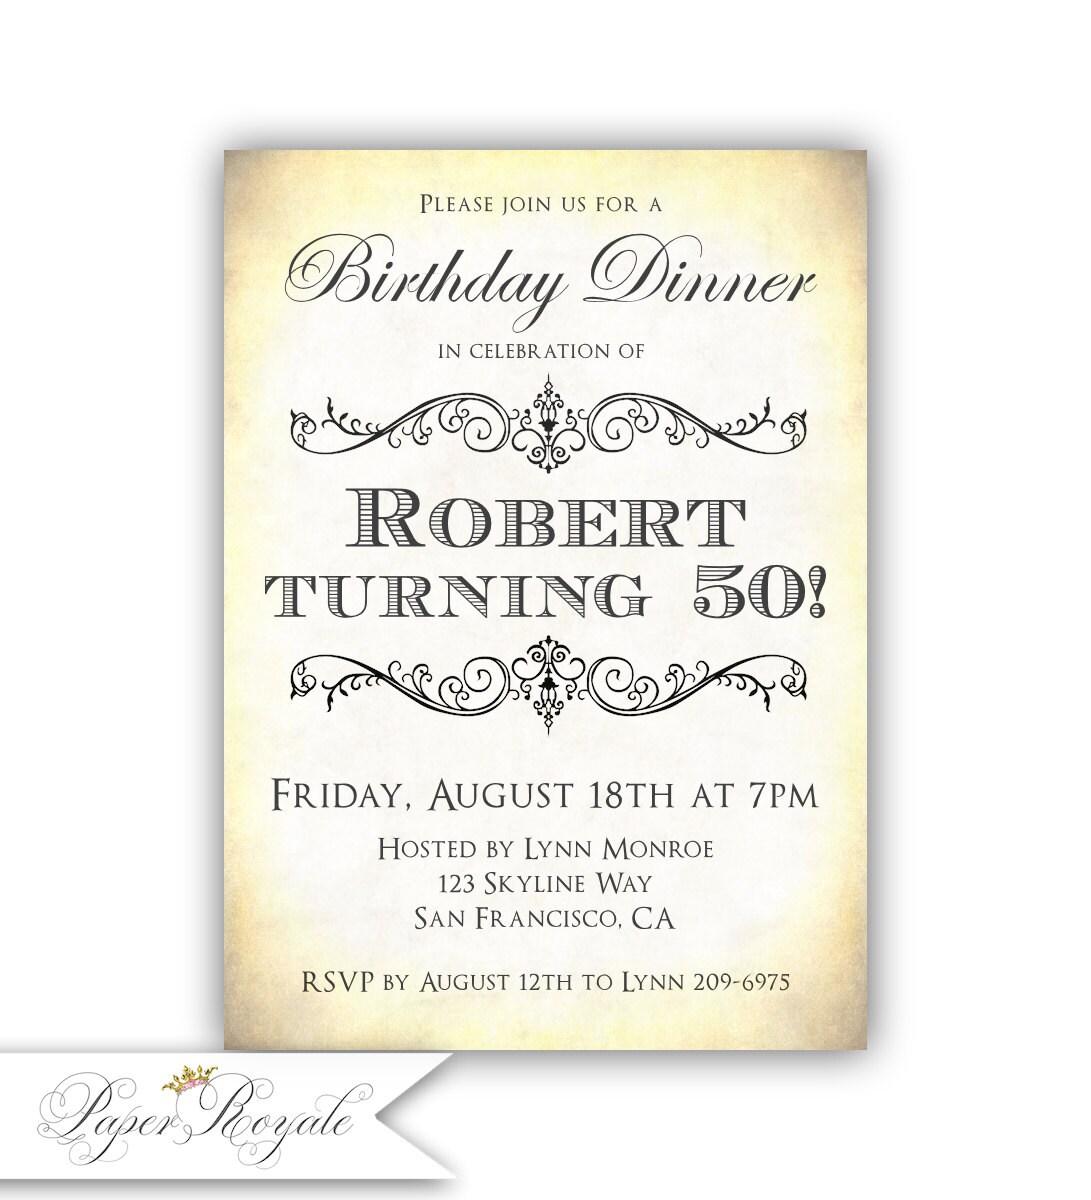 Adult Birthday Invitations Birthday Dinner Invitations 50th